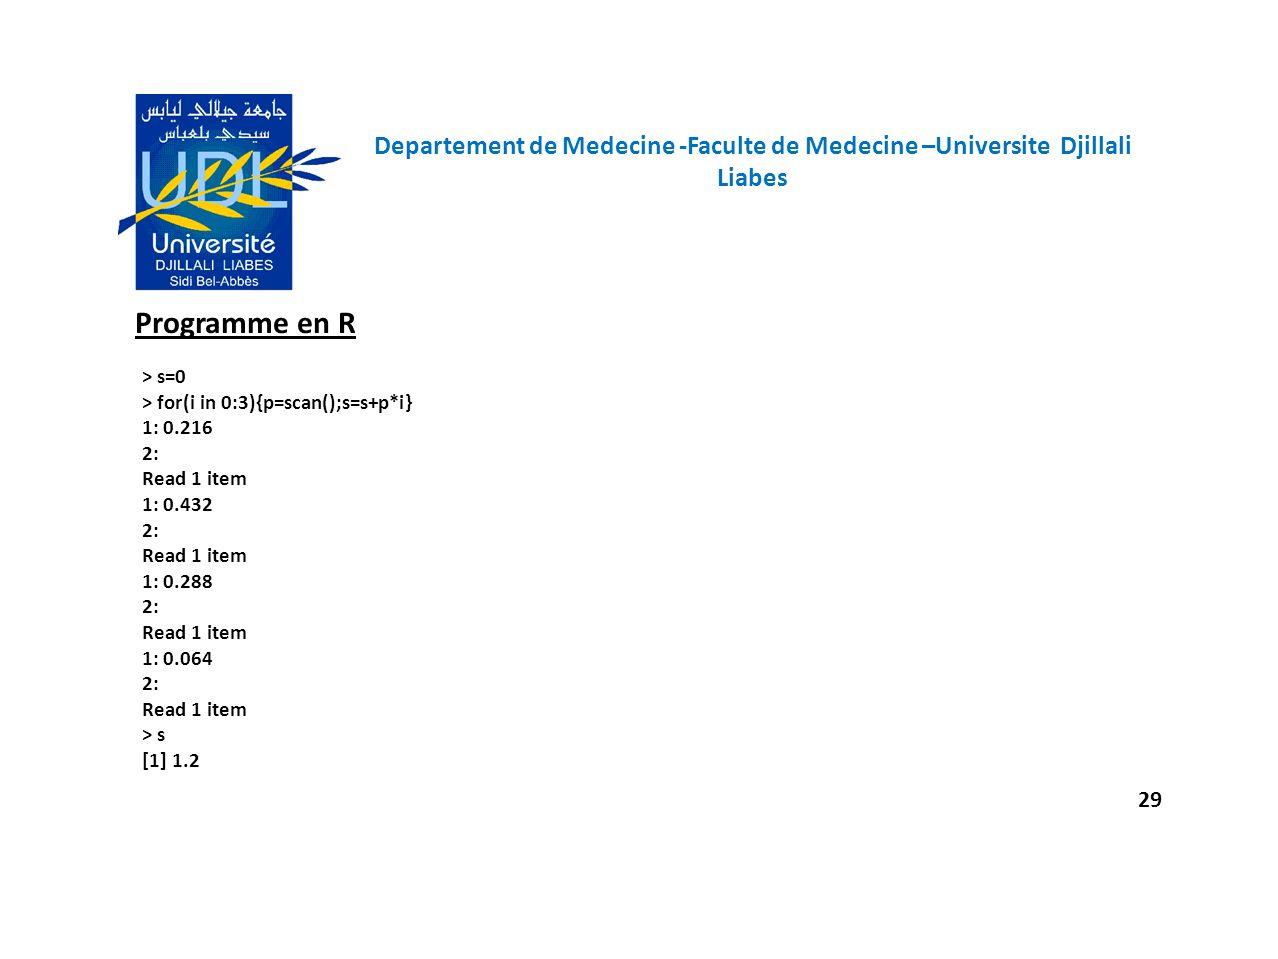 Departement de Medecine -Faculte de Medecine –Universite Djillali Liabes 29 Programme en R > s=0 > for(i in 0:3){p=scan();s=s+p*i} 1: 0.216 2: Read 1